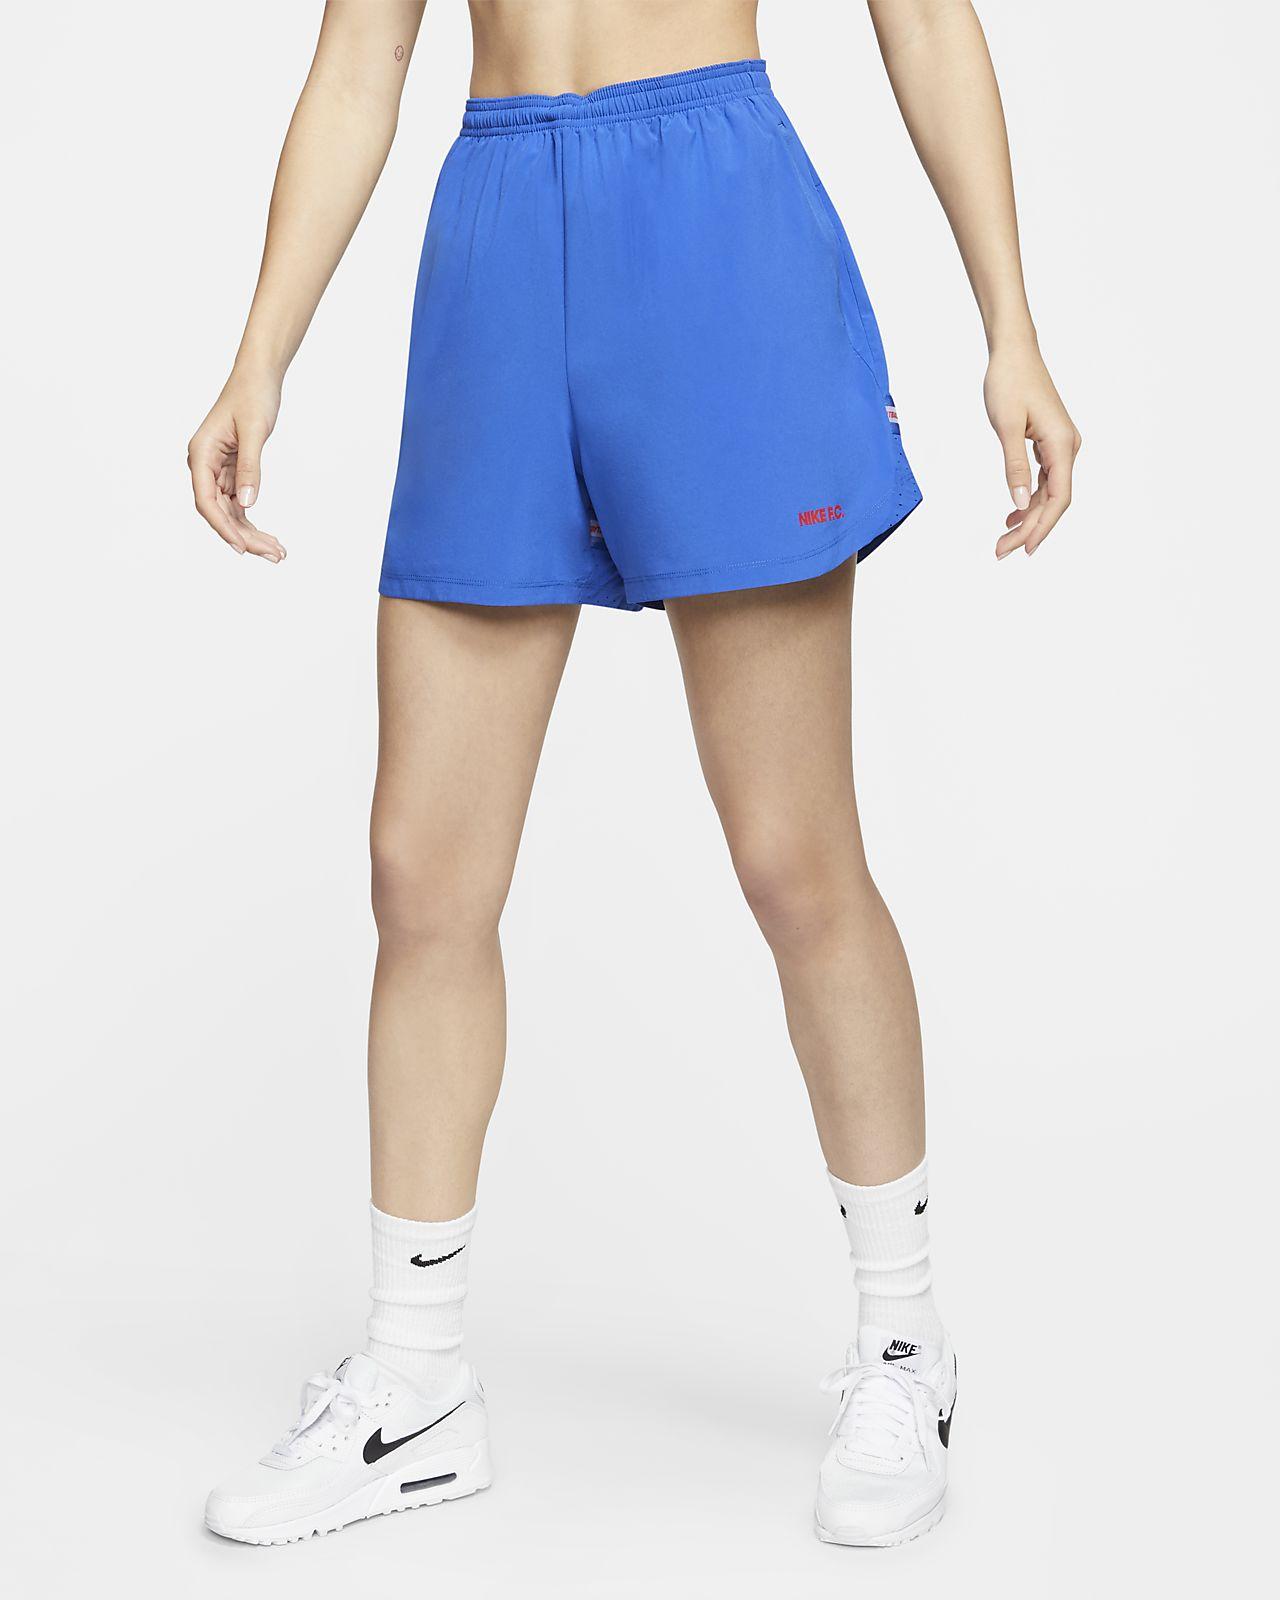 Shorts de fútbol para mujer Nike F.C.